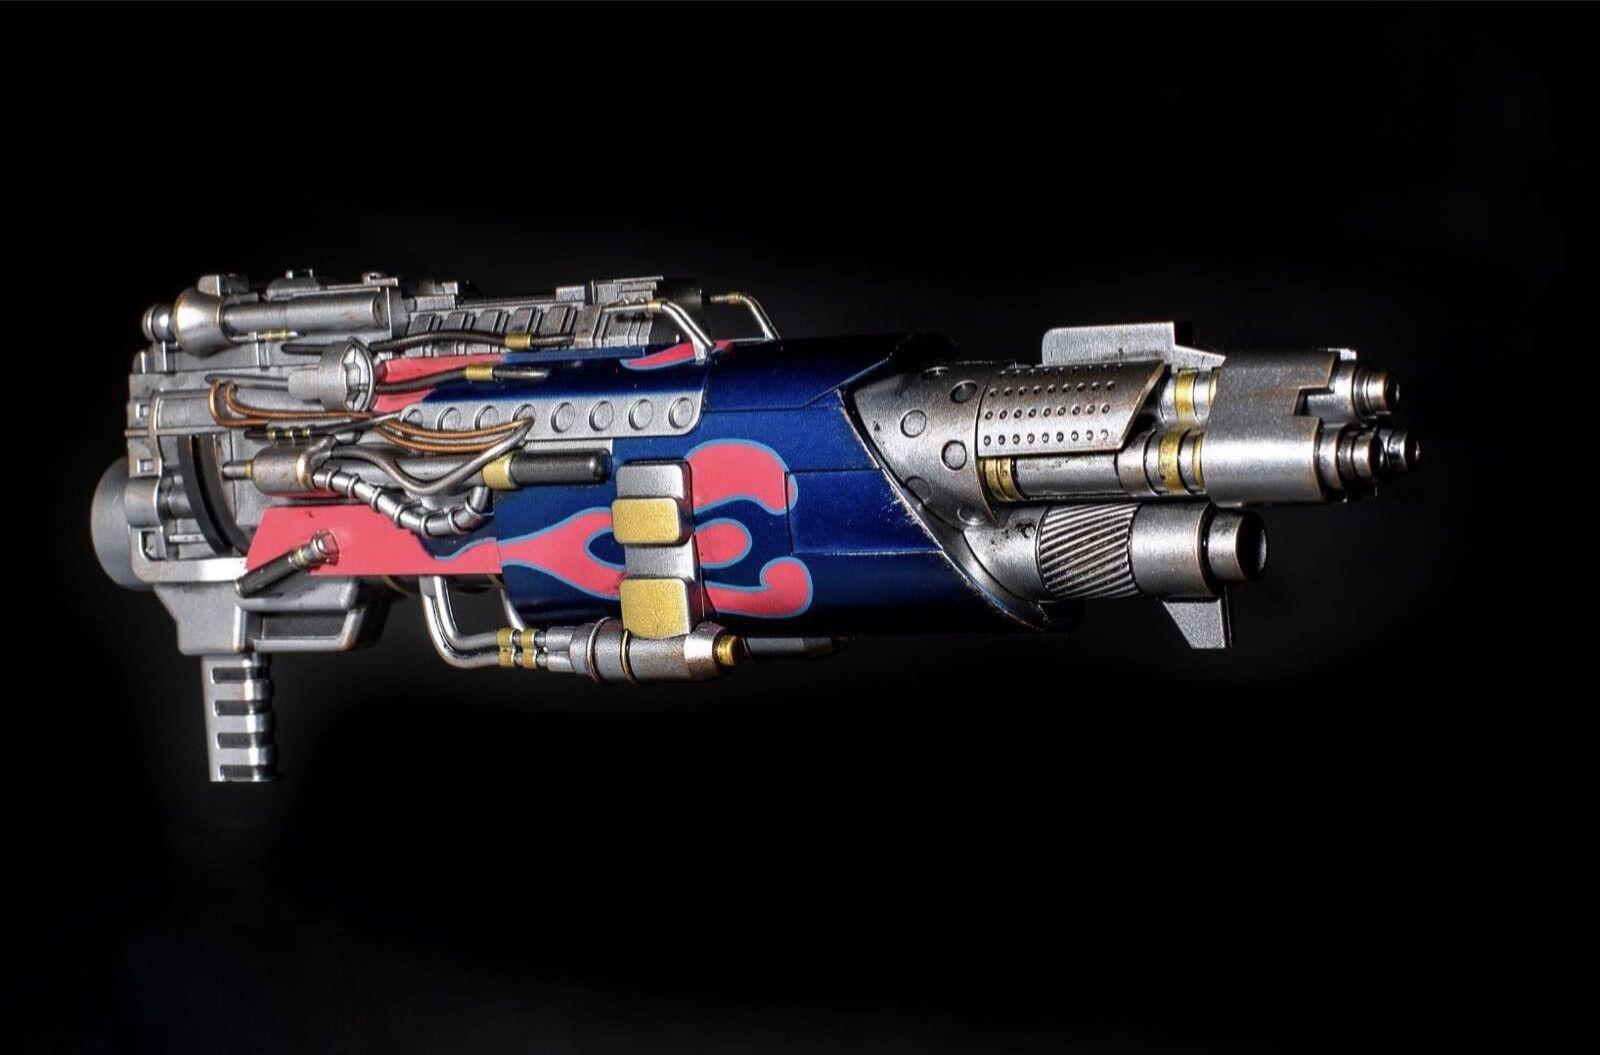 2GOODCO Battle Blaster Comicave 1 22 Diecast Allory  Optimus Prime OP Gun Model